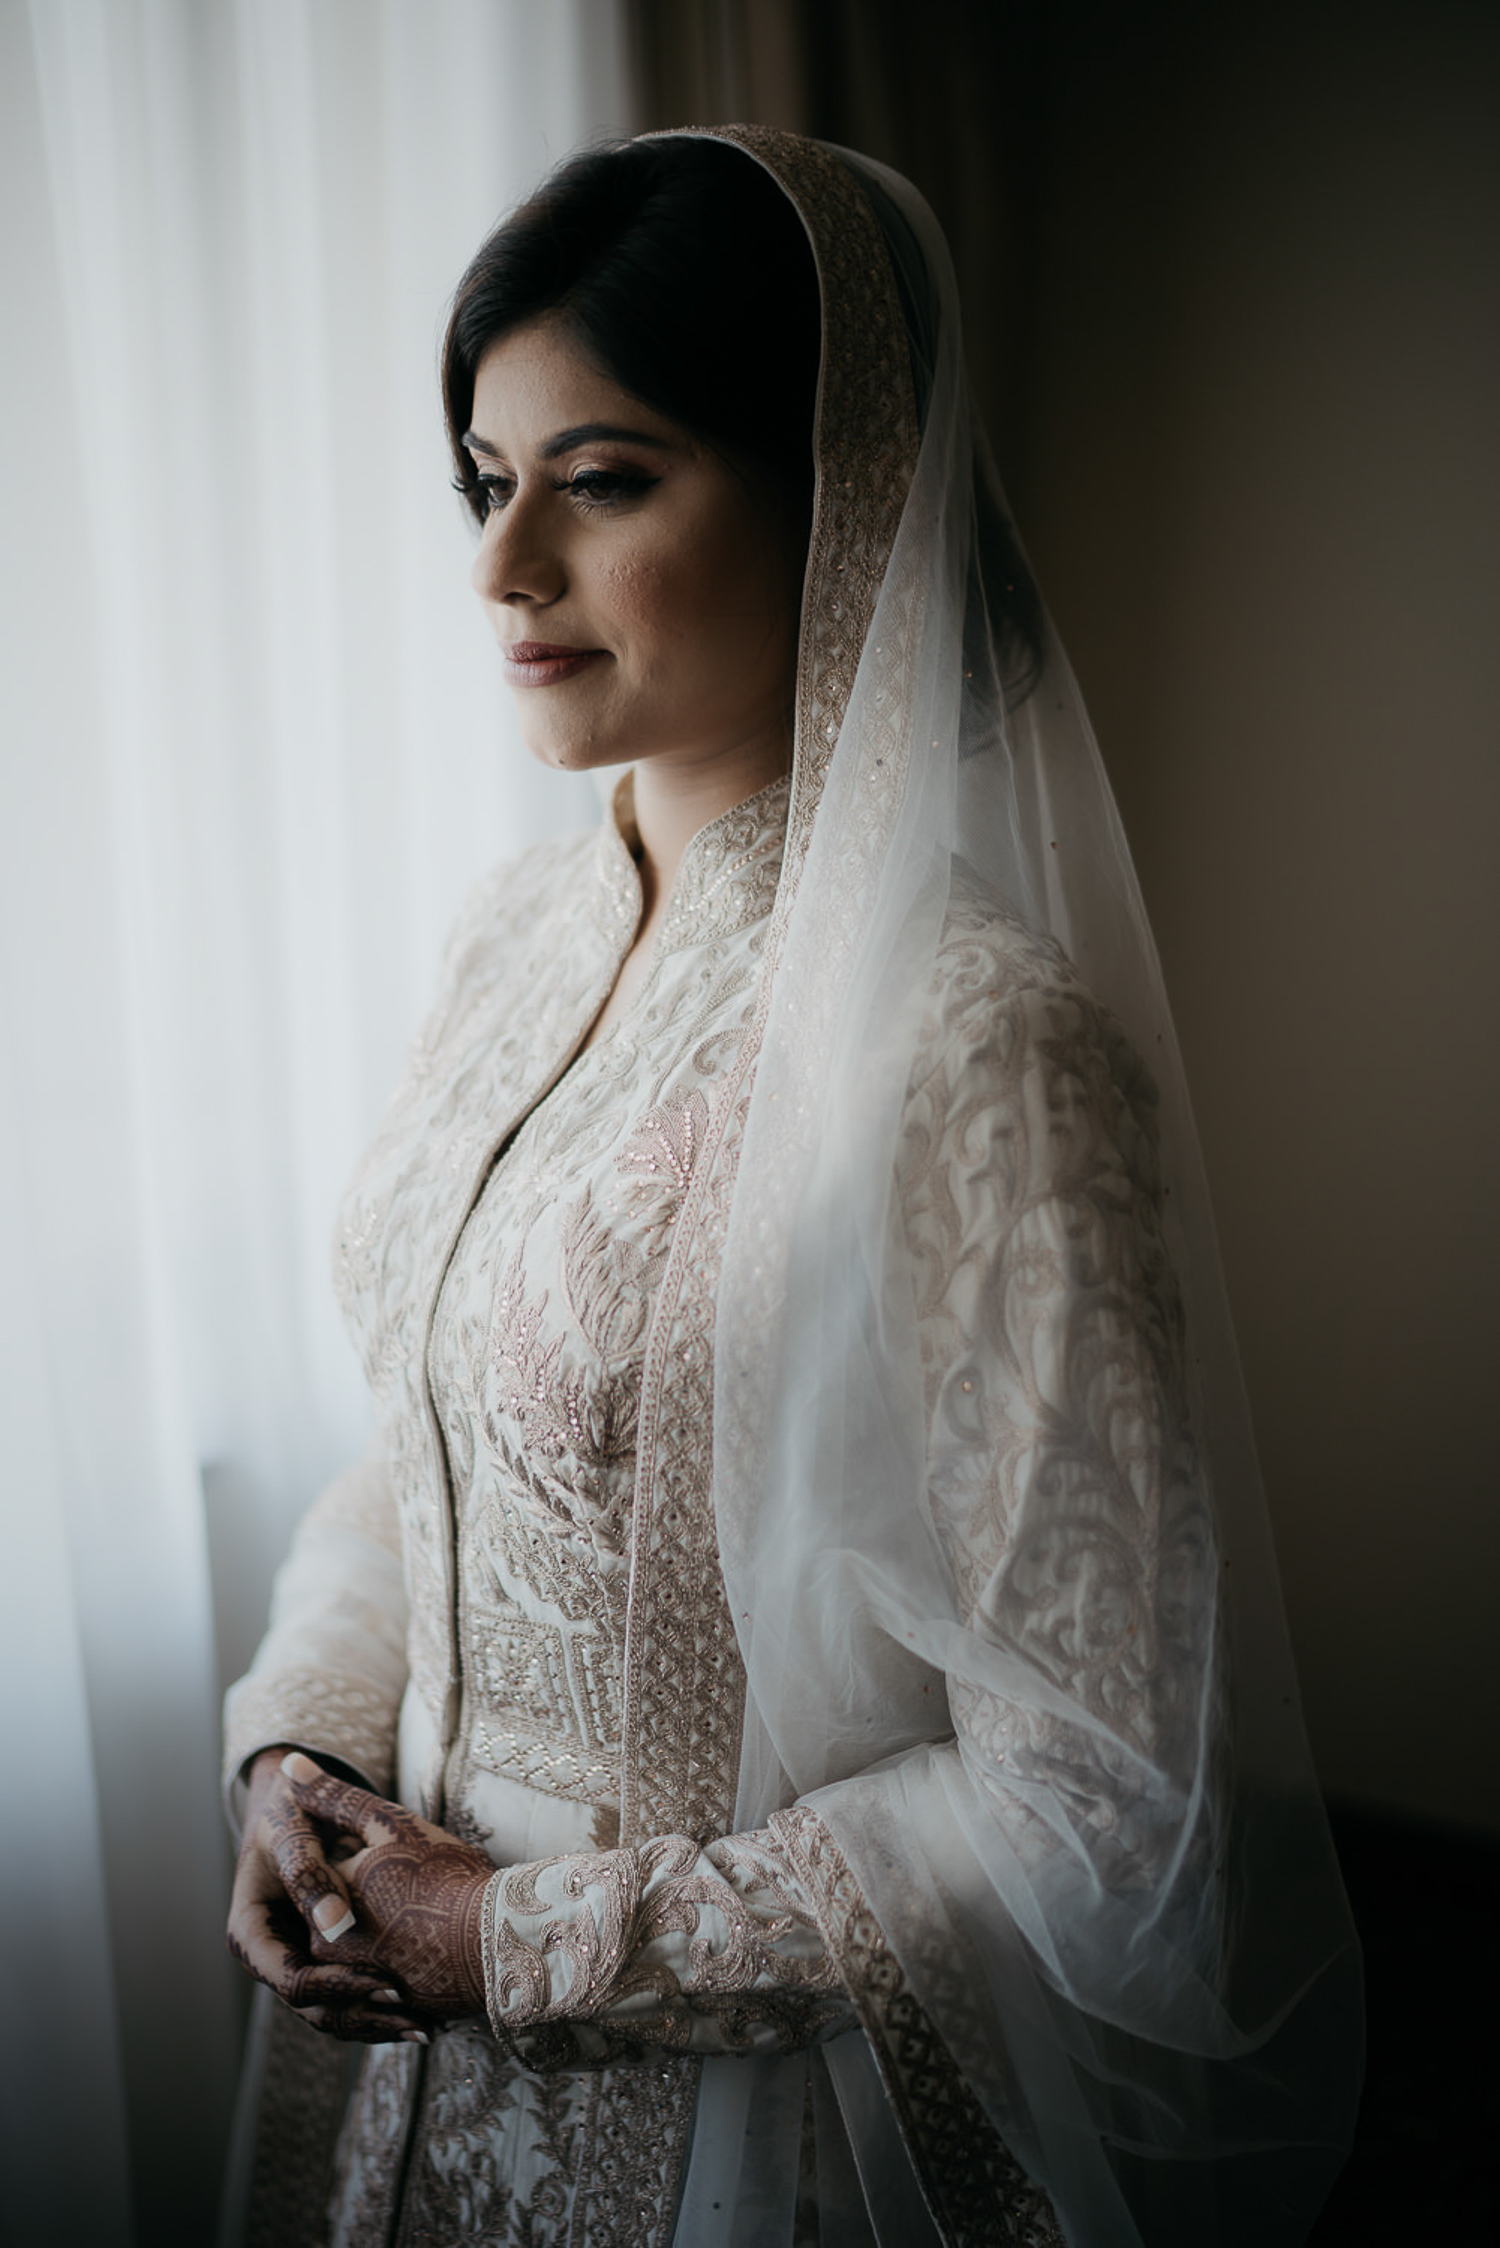 indian wedding bridal portrait tanzania photographer mark hadden